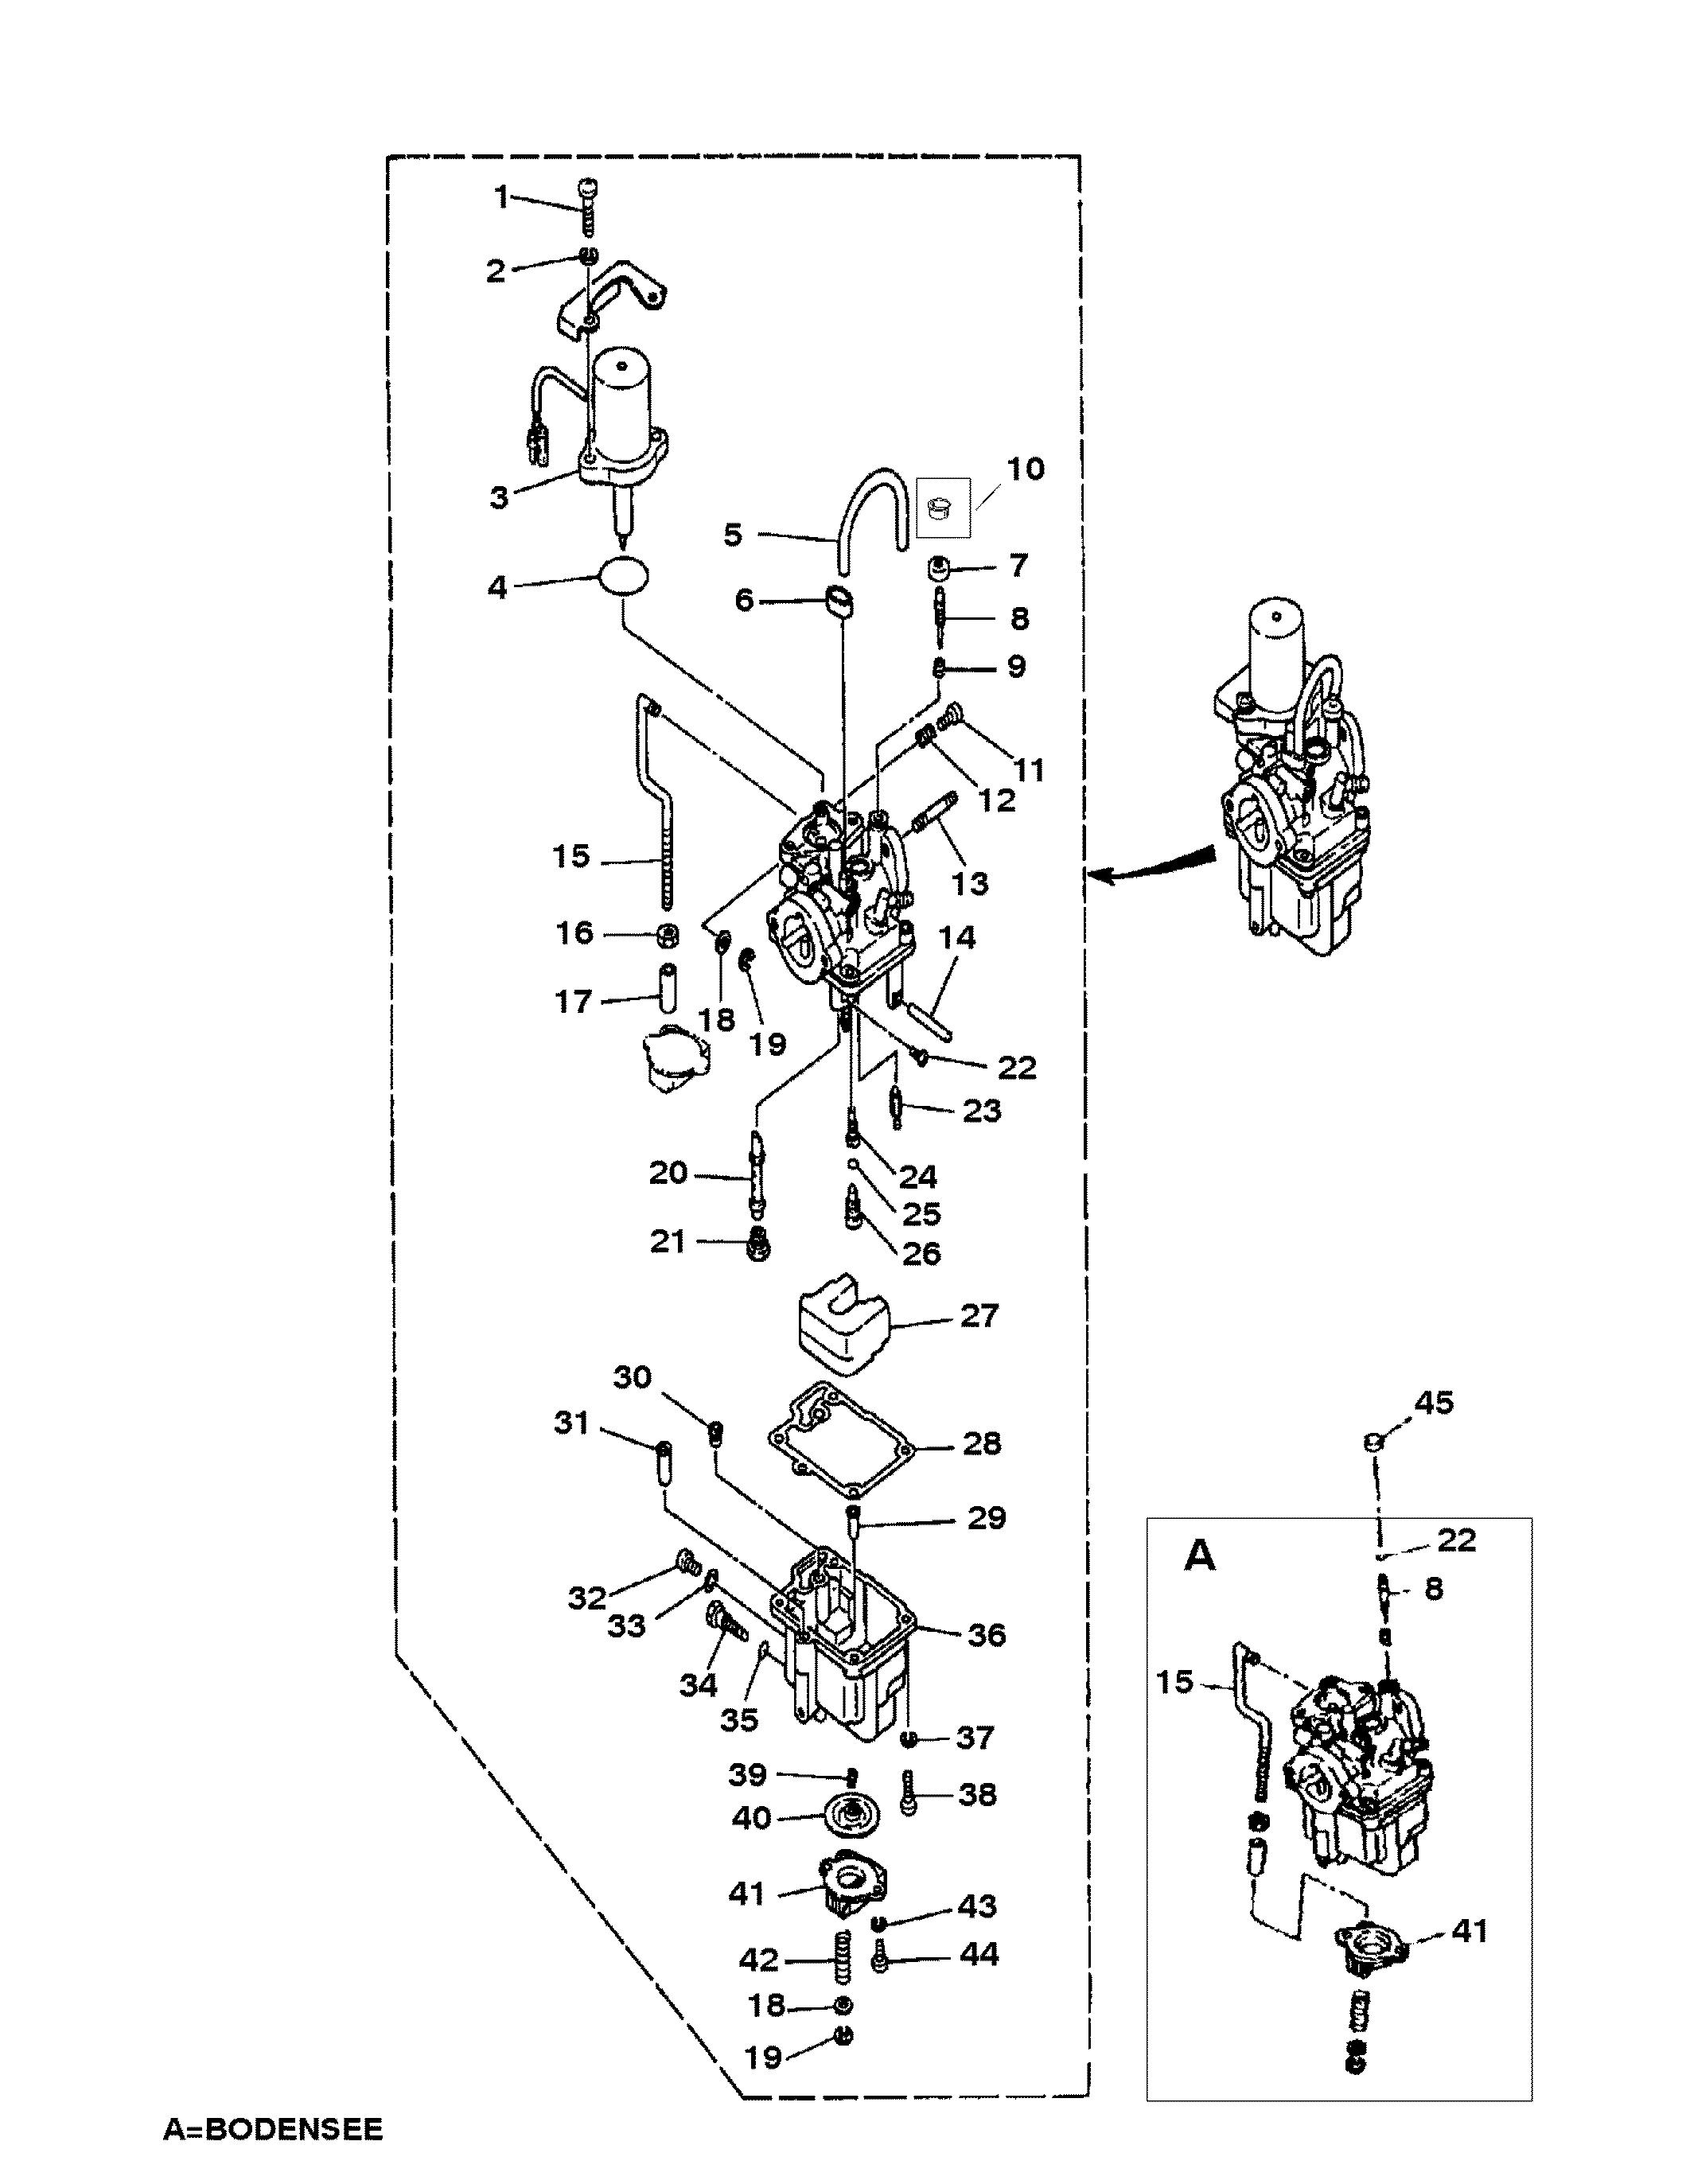 Printable Wiring Diagram For Mercury 9 9 Engine   Ot635760